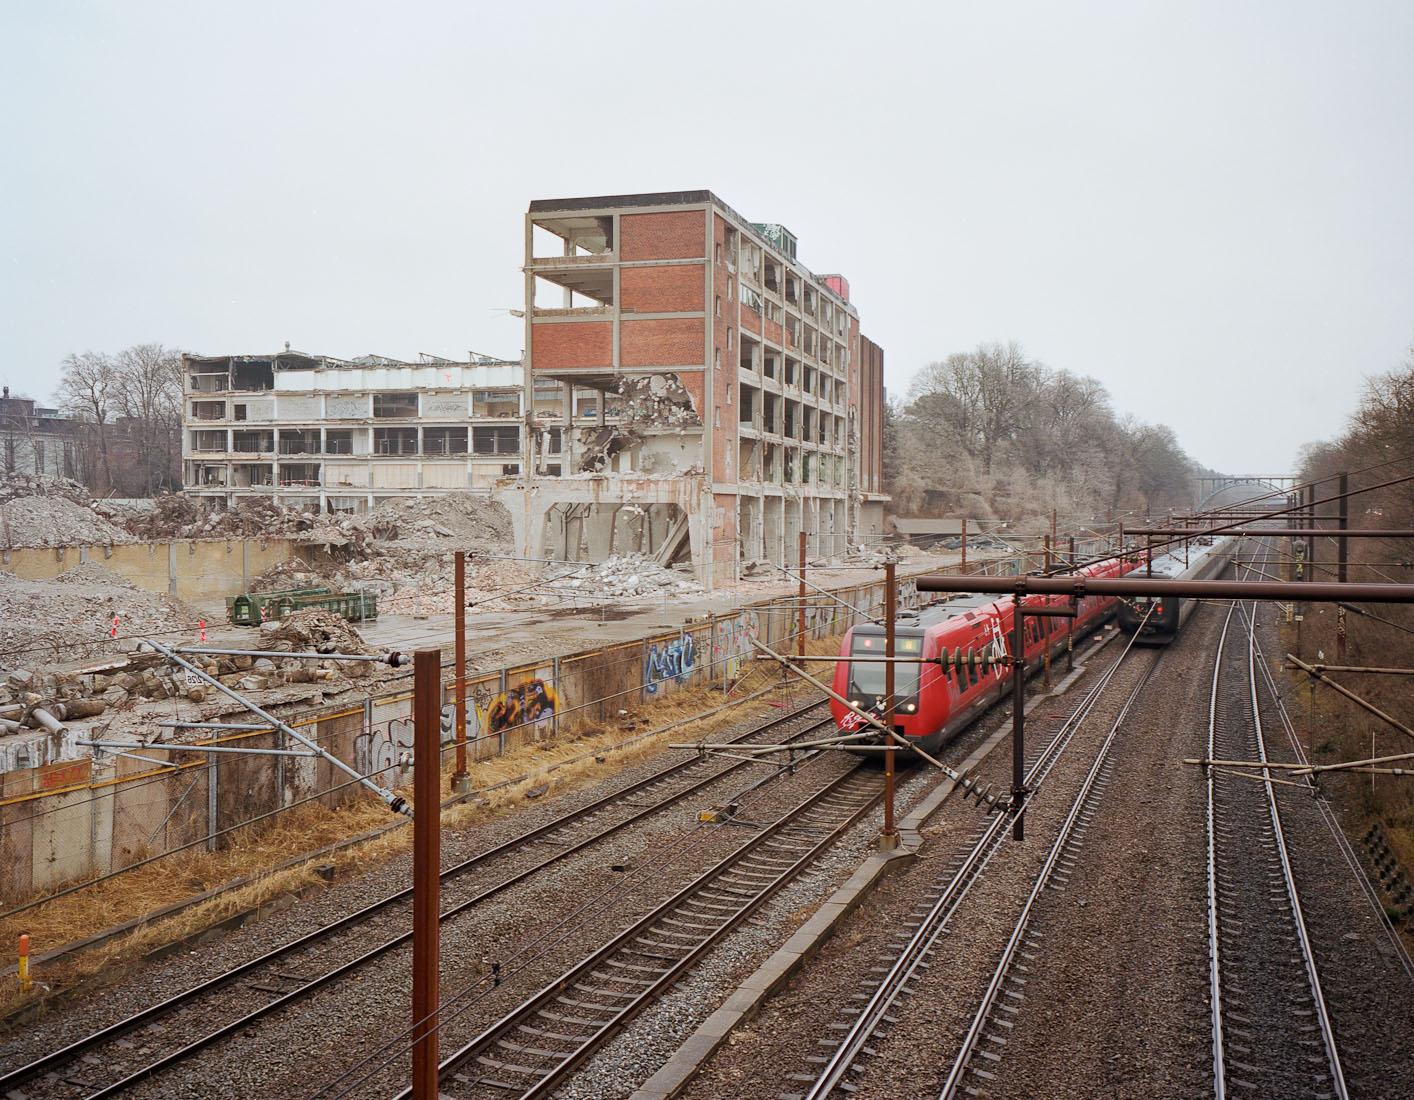 20130426-Toge ved Carlsberg